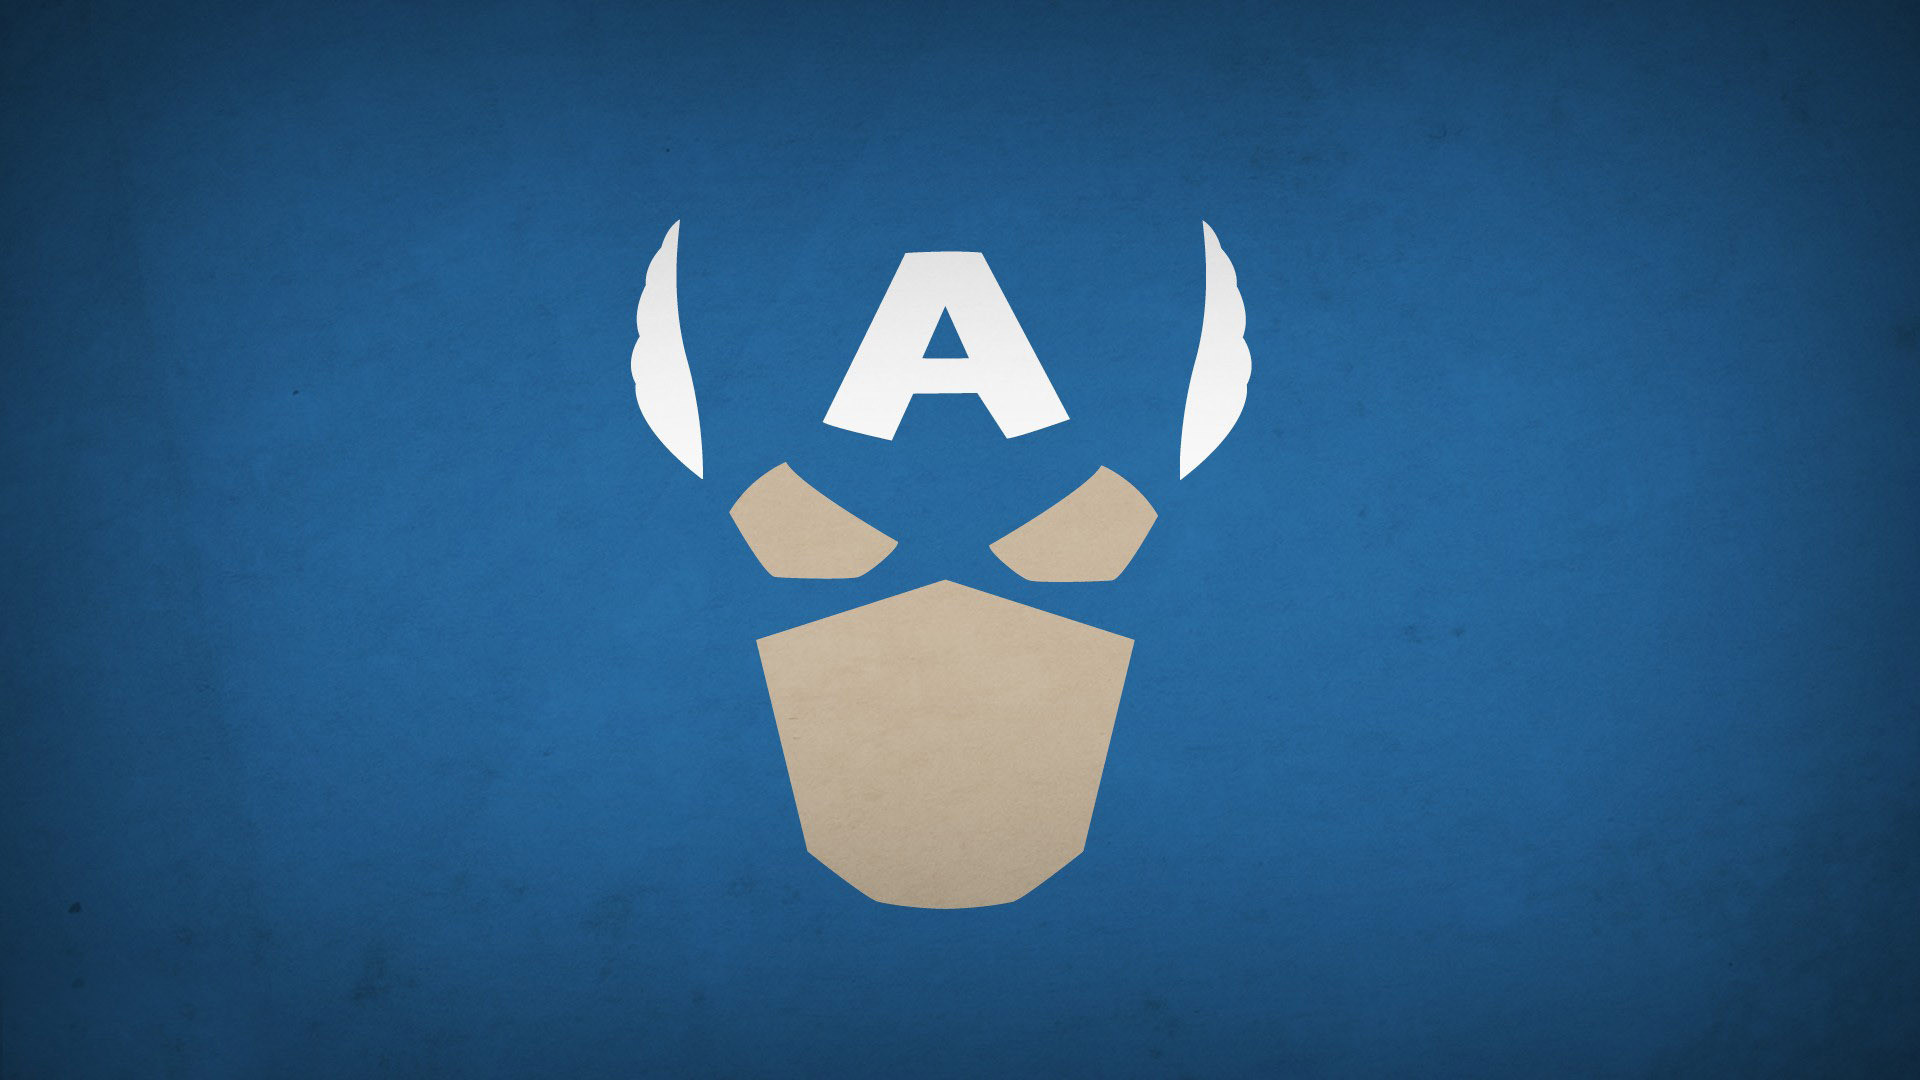 Captain America Shield Wallpaper HD (84+ Images